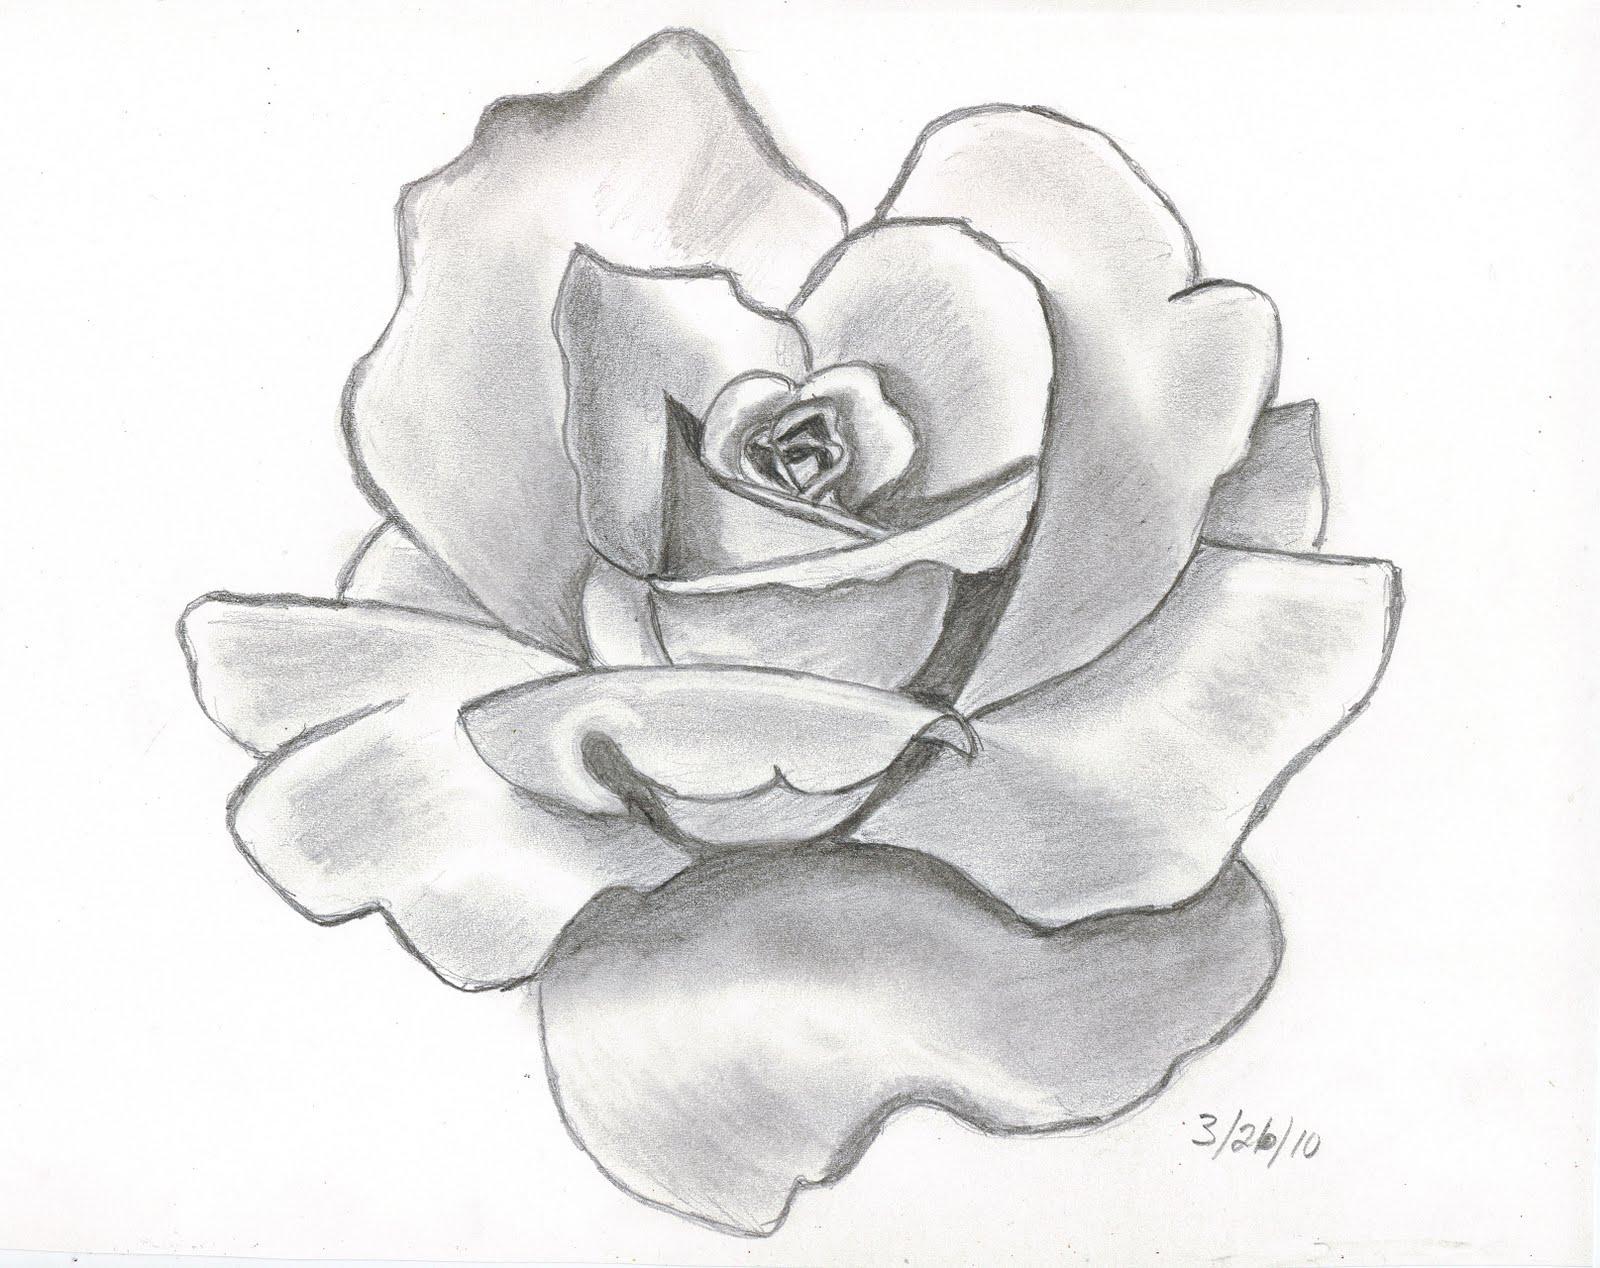 Drawn pencil drawing Pencil tattoo drawings rose Sketches